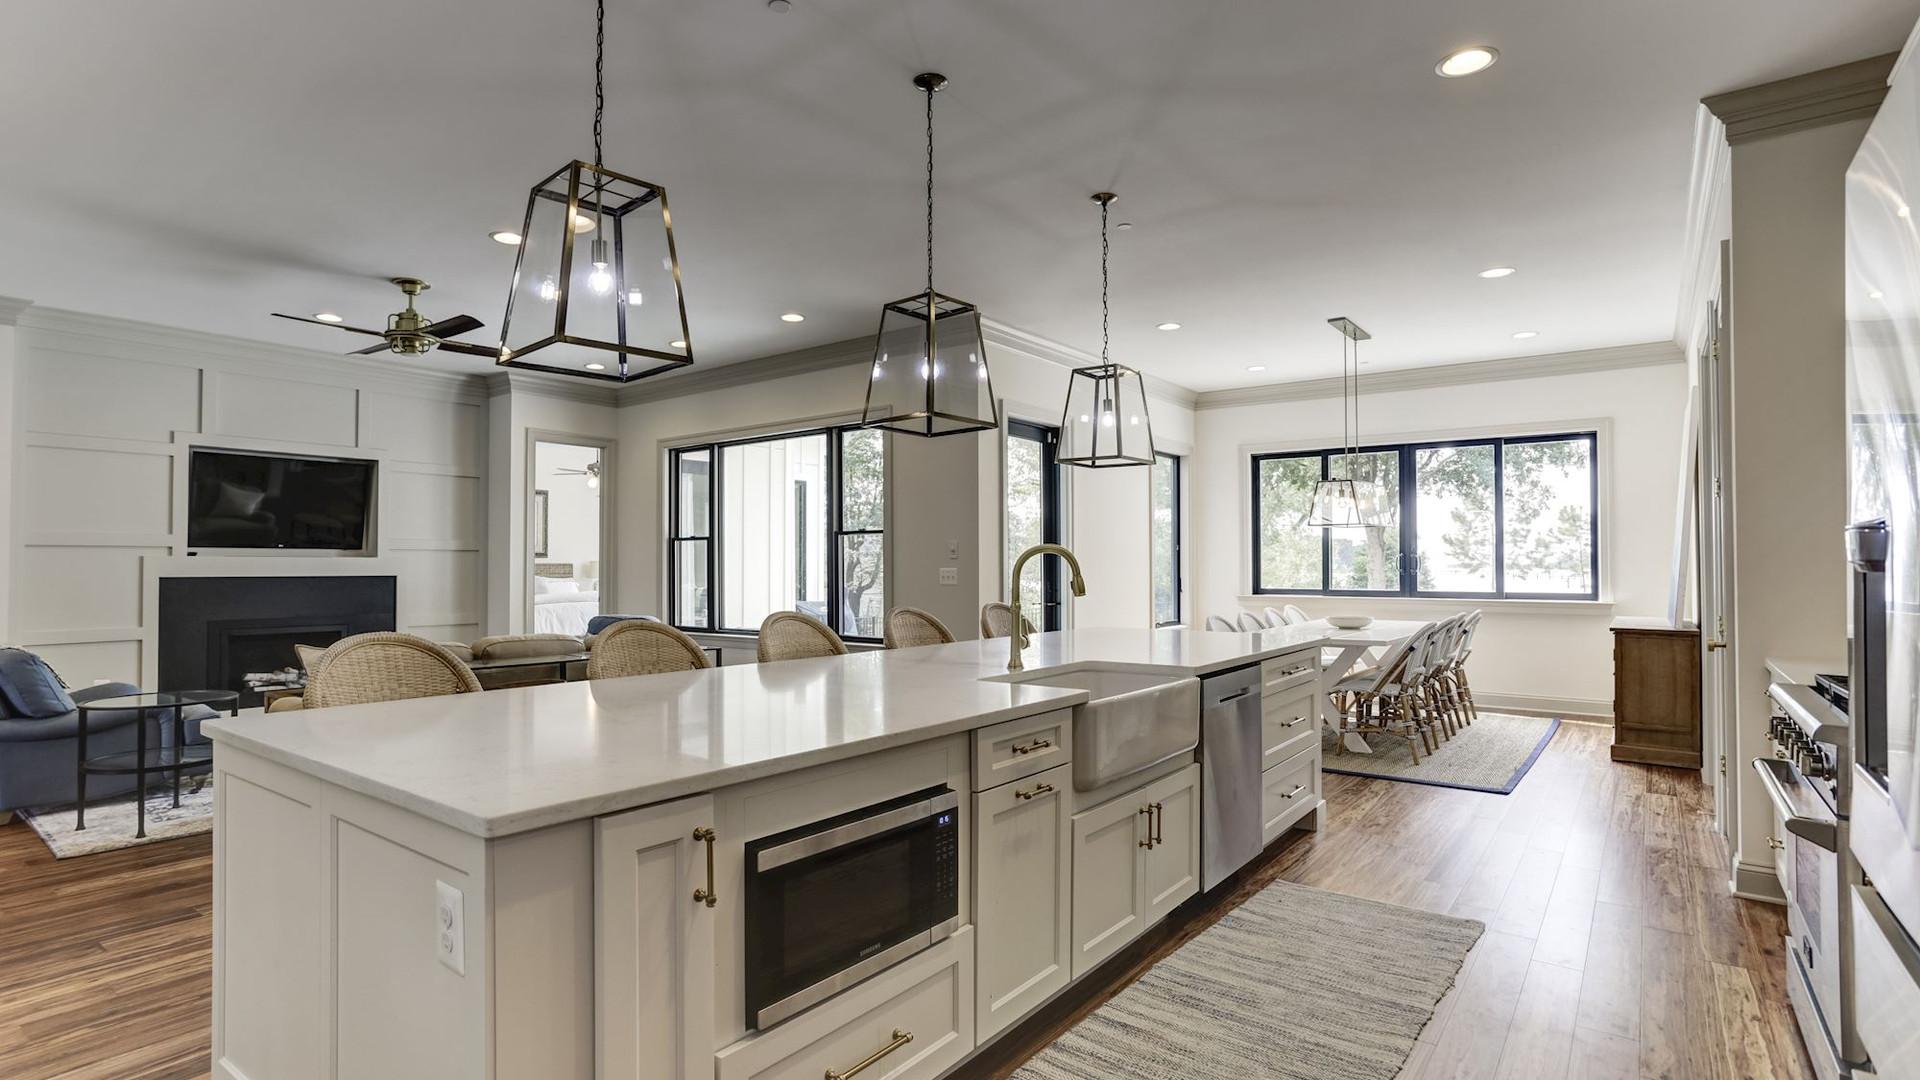 Custom kitchen island and lighting